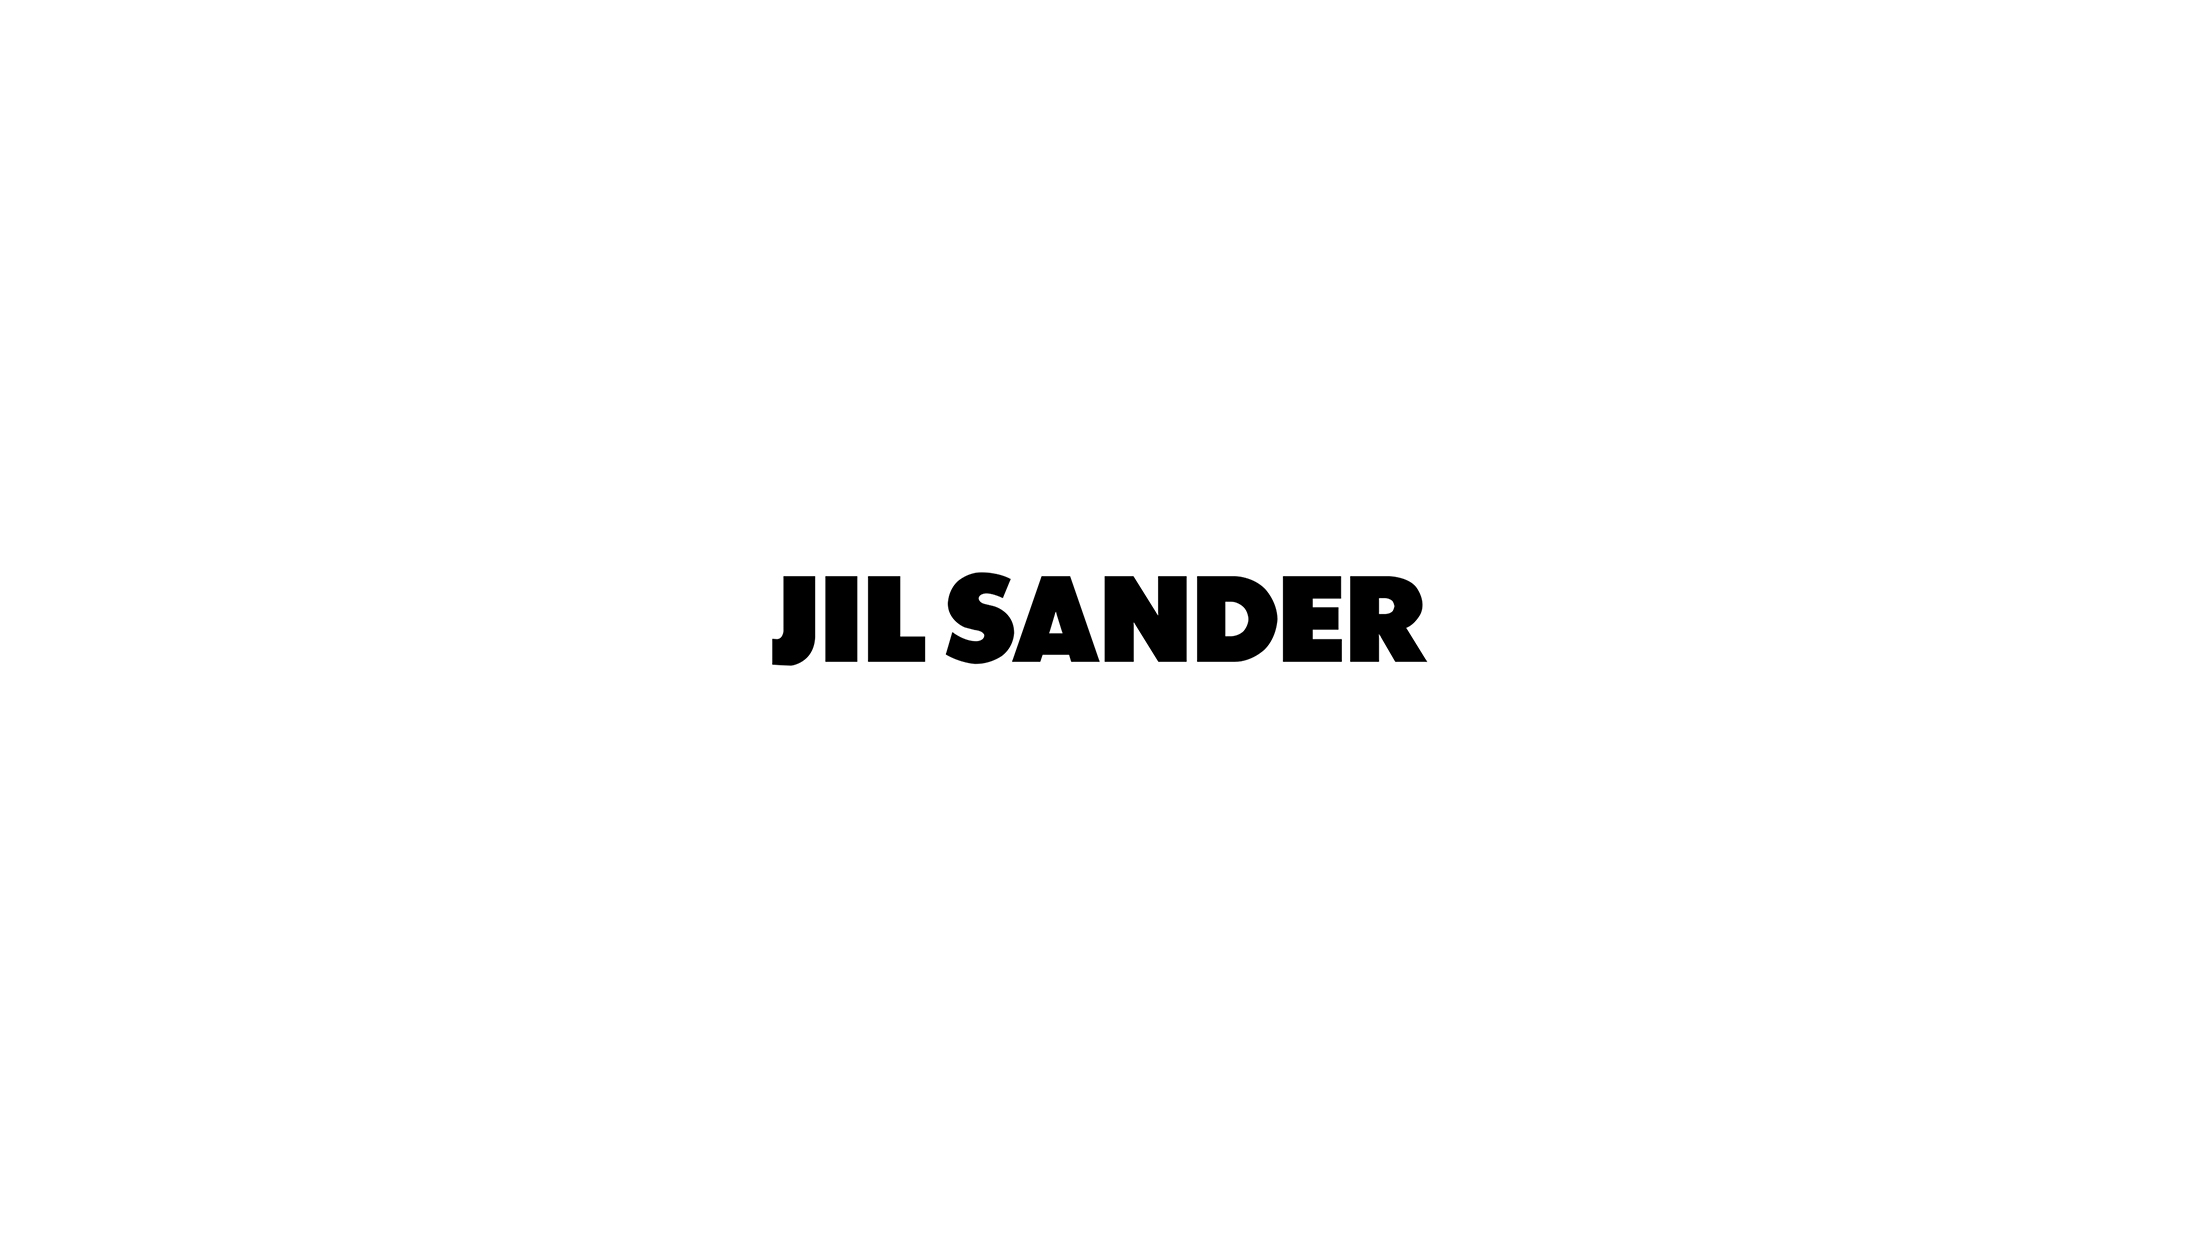 JIL SANDER 🗂